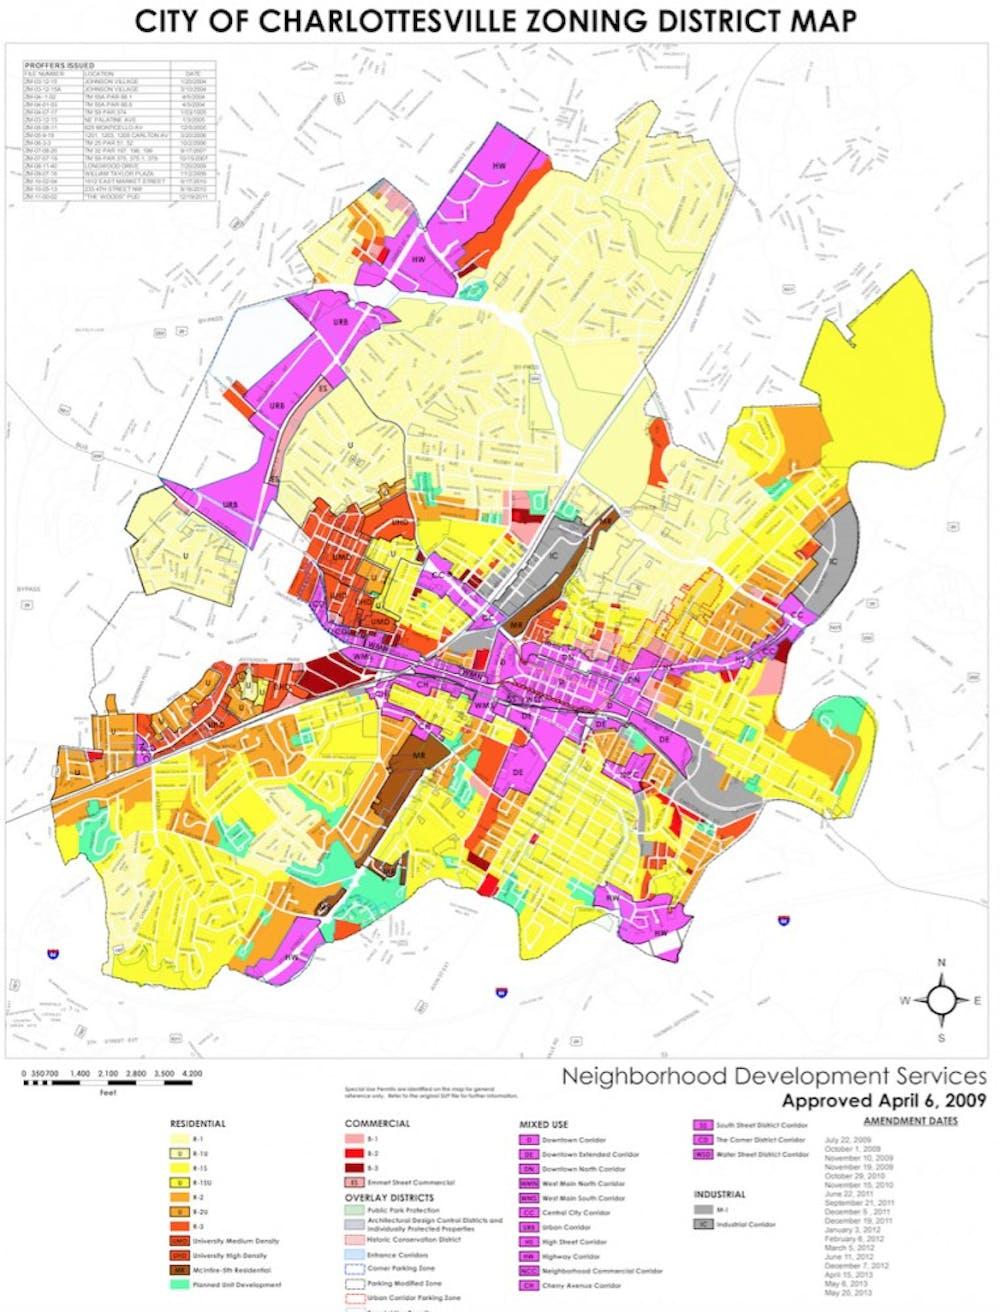 op-zoningmap-courtesycityofcharlottesville